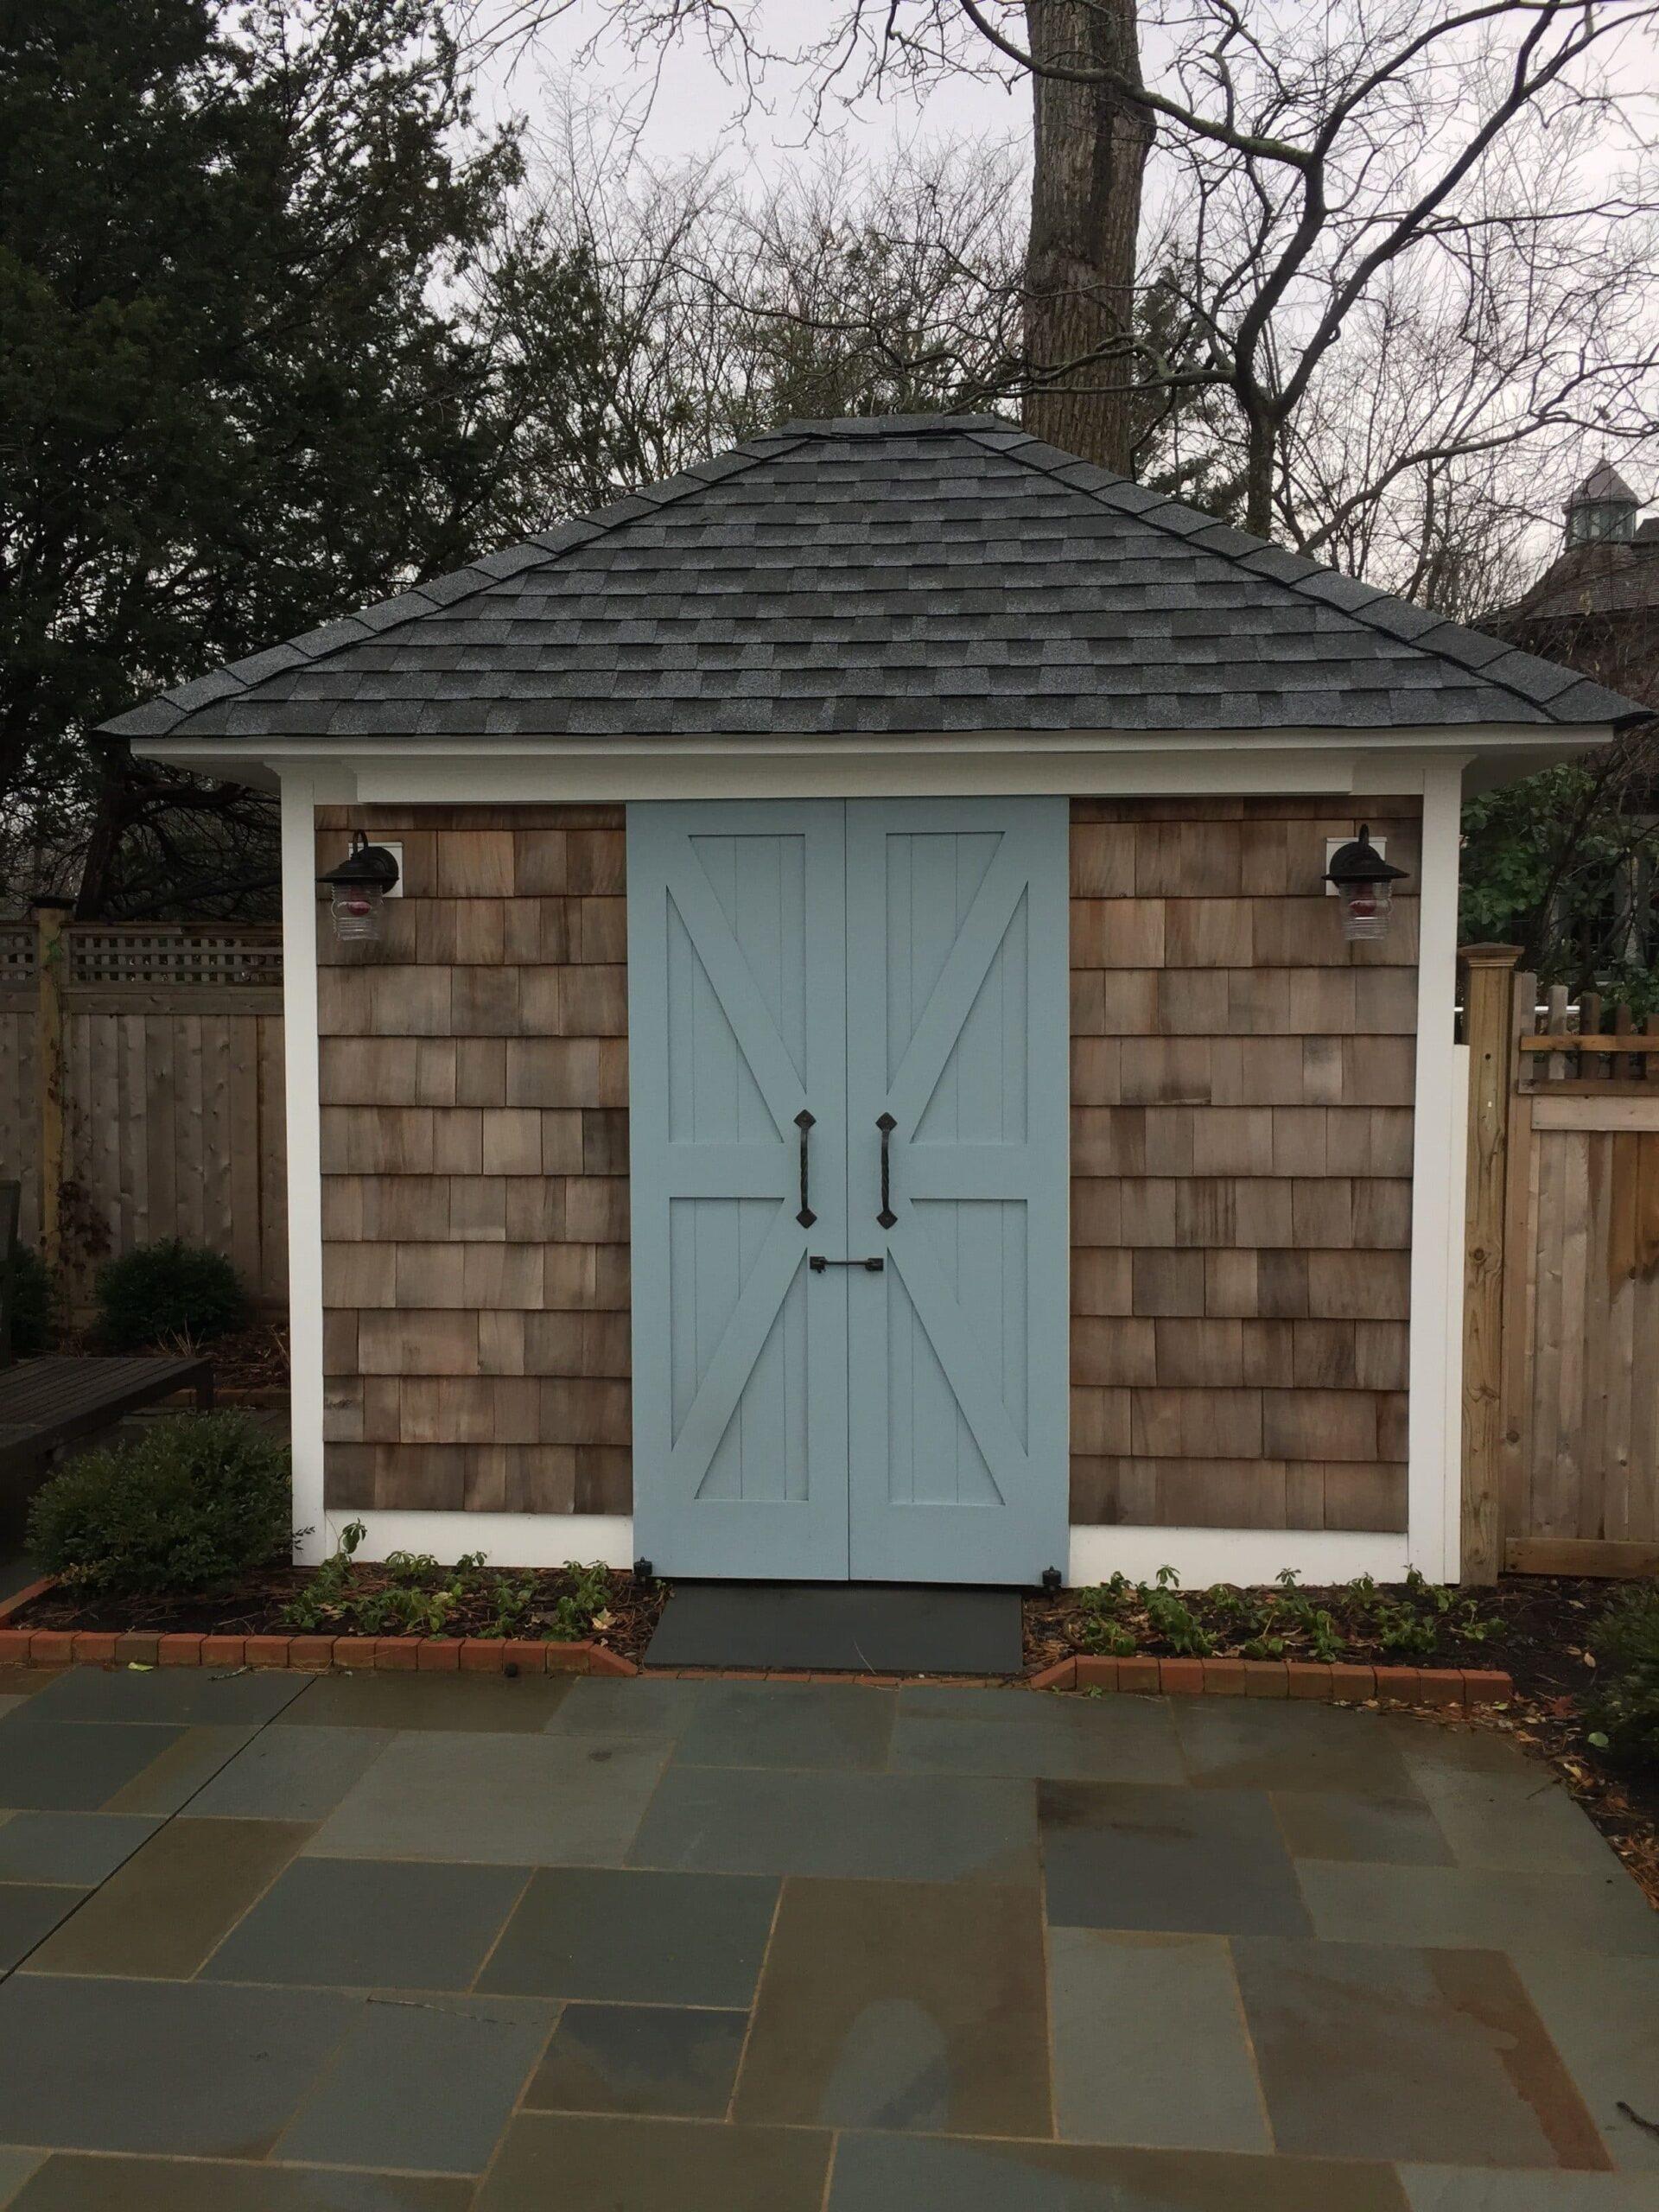 15. CL15B design – Bi-parting sliding doors at pool sheds; Fair Haven, NJ